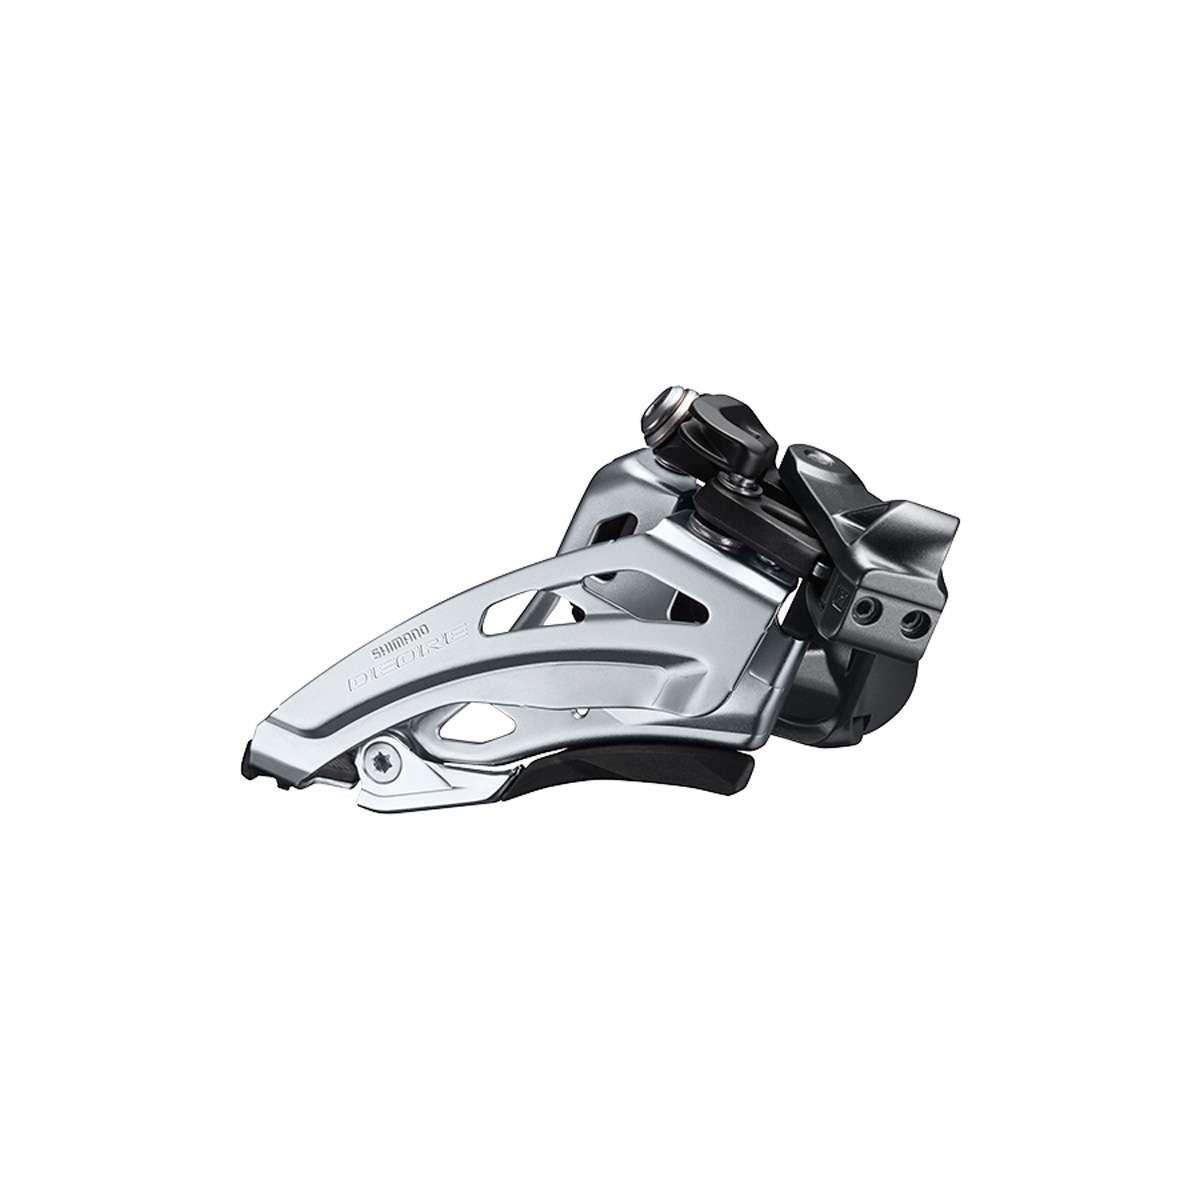 Shimano Deore m6000マウンテン自転車フロントDerailleur – fd-m6020-l – ifdm6020lx6 B073J2R7YF